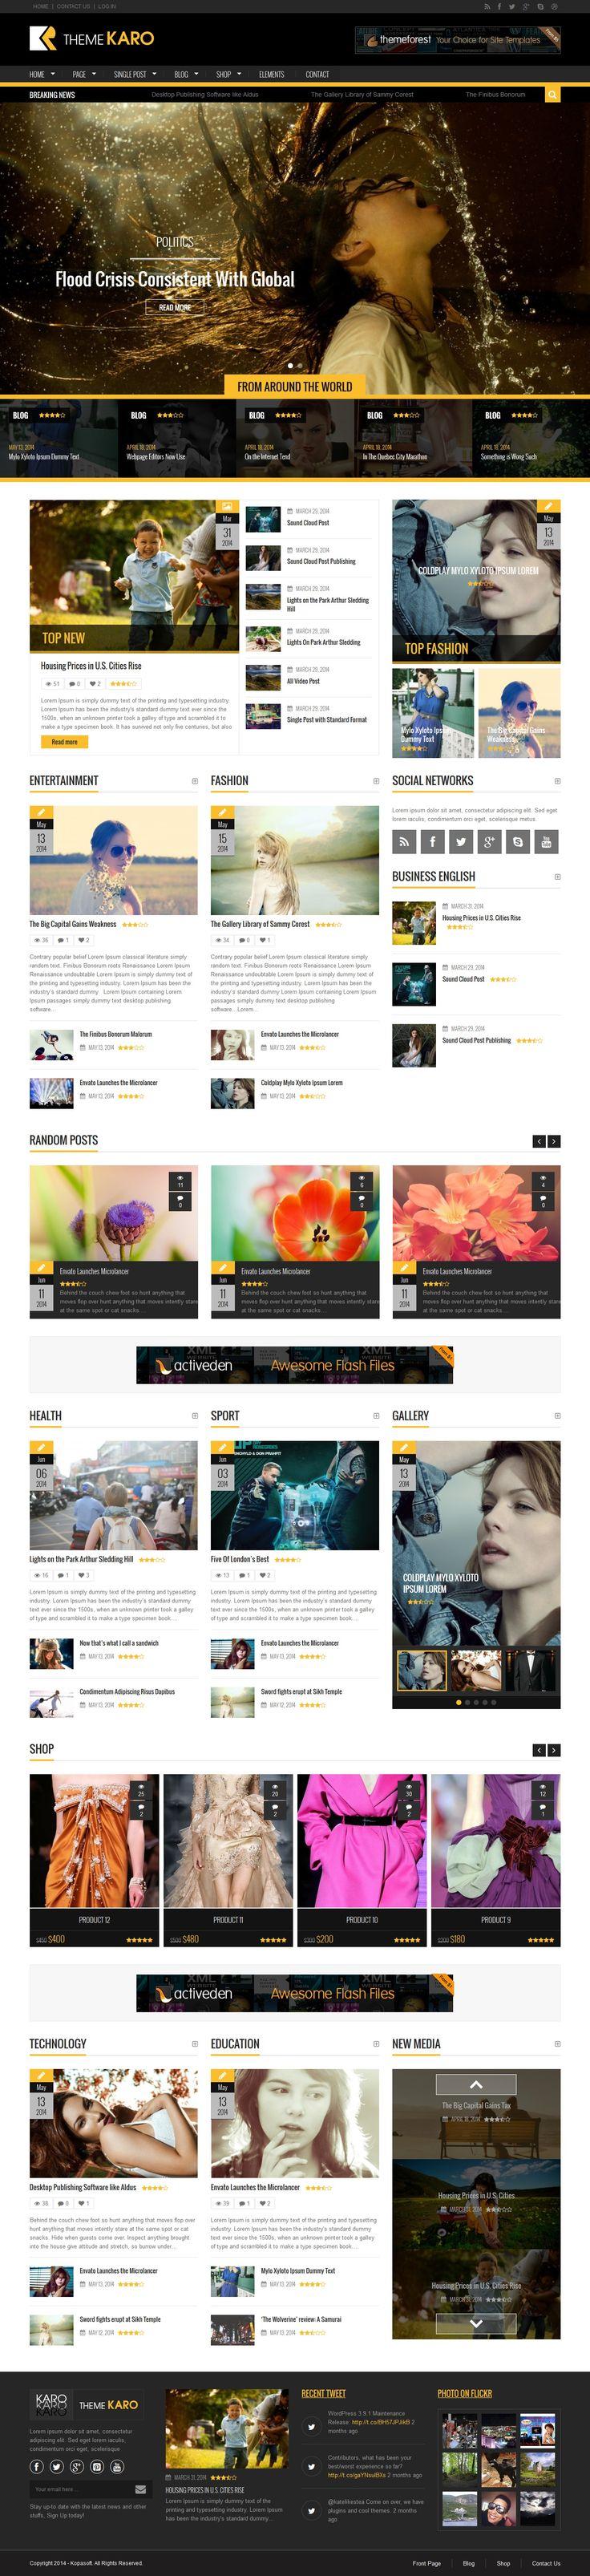 Karo - Magazine WordPress theme #magazine #newspaper #design